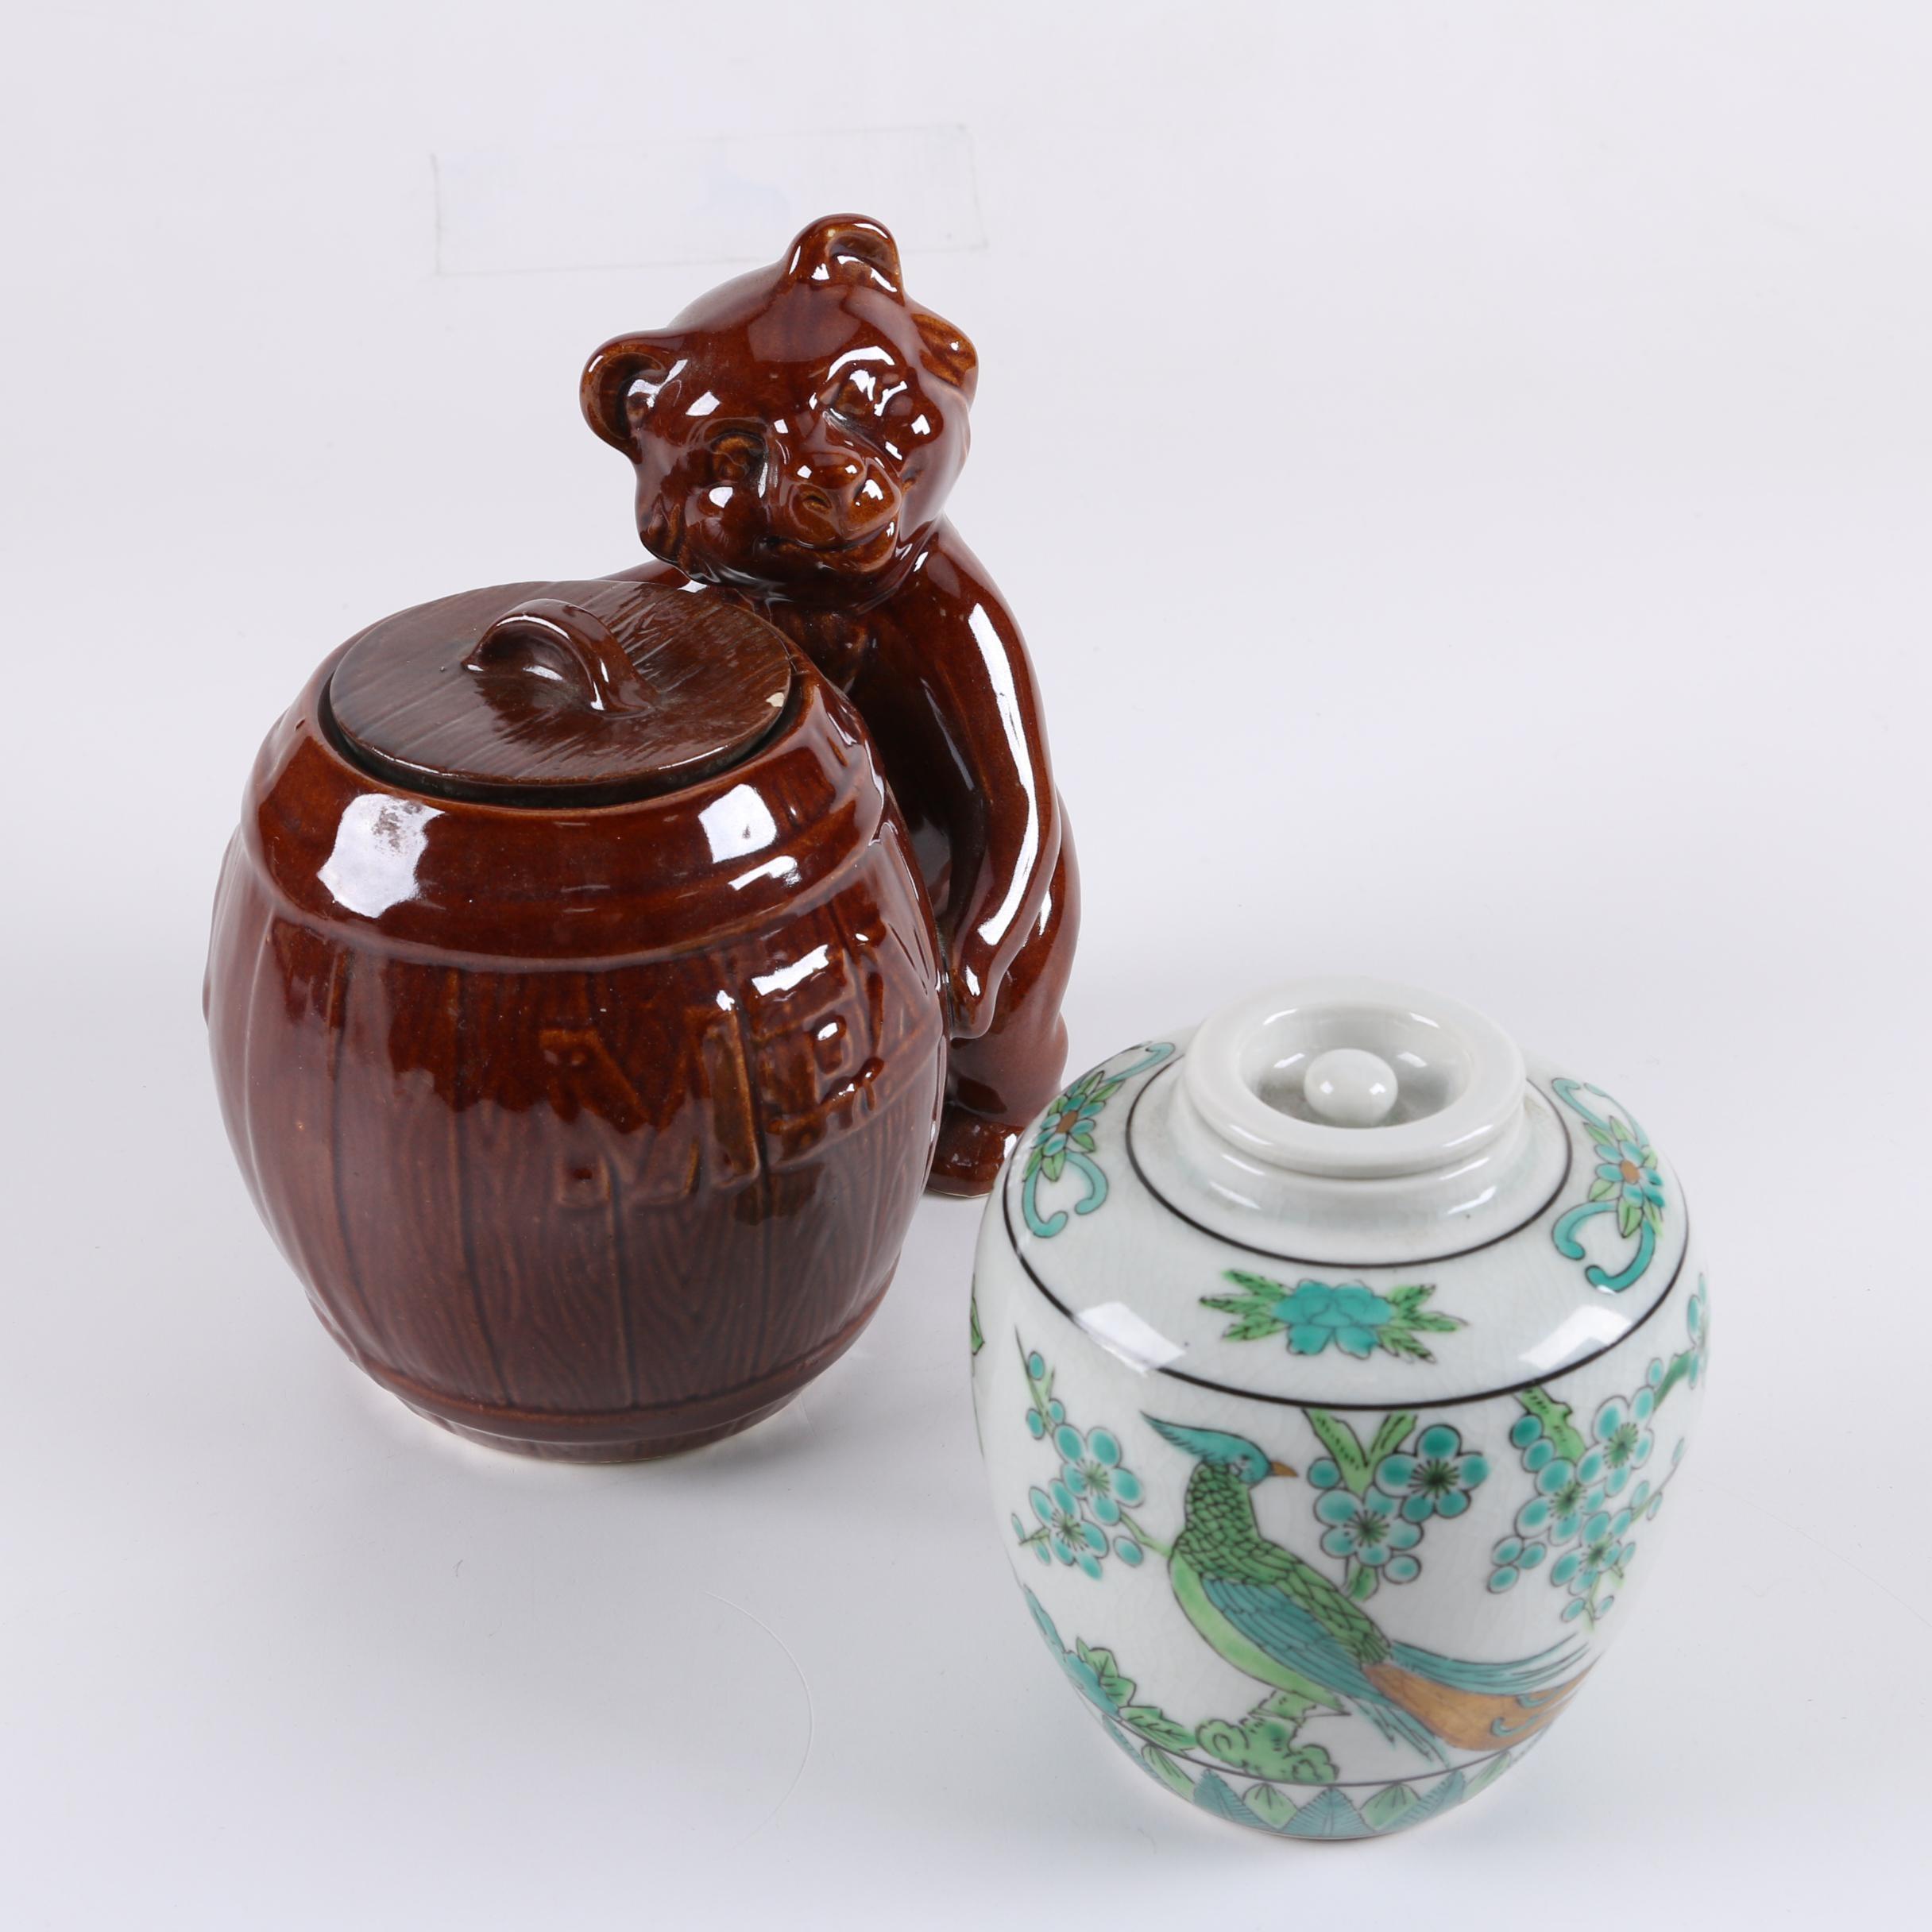 Decorative Lidded Ceramic Jars